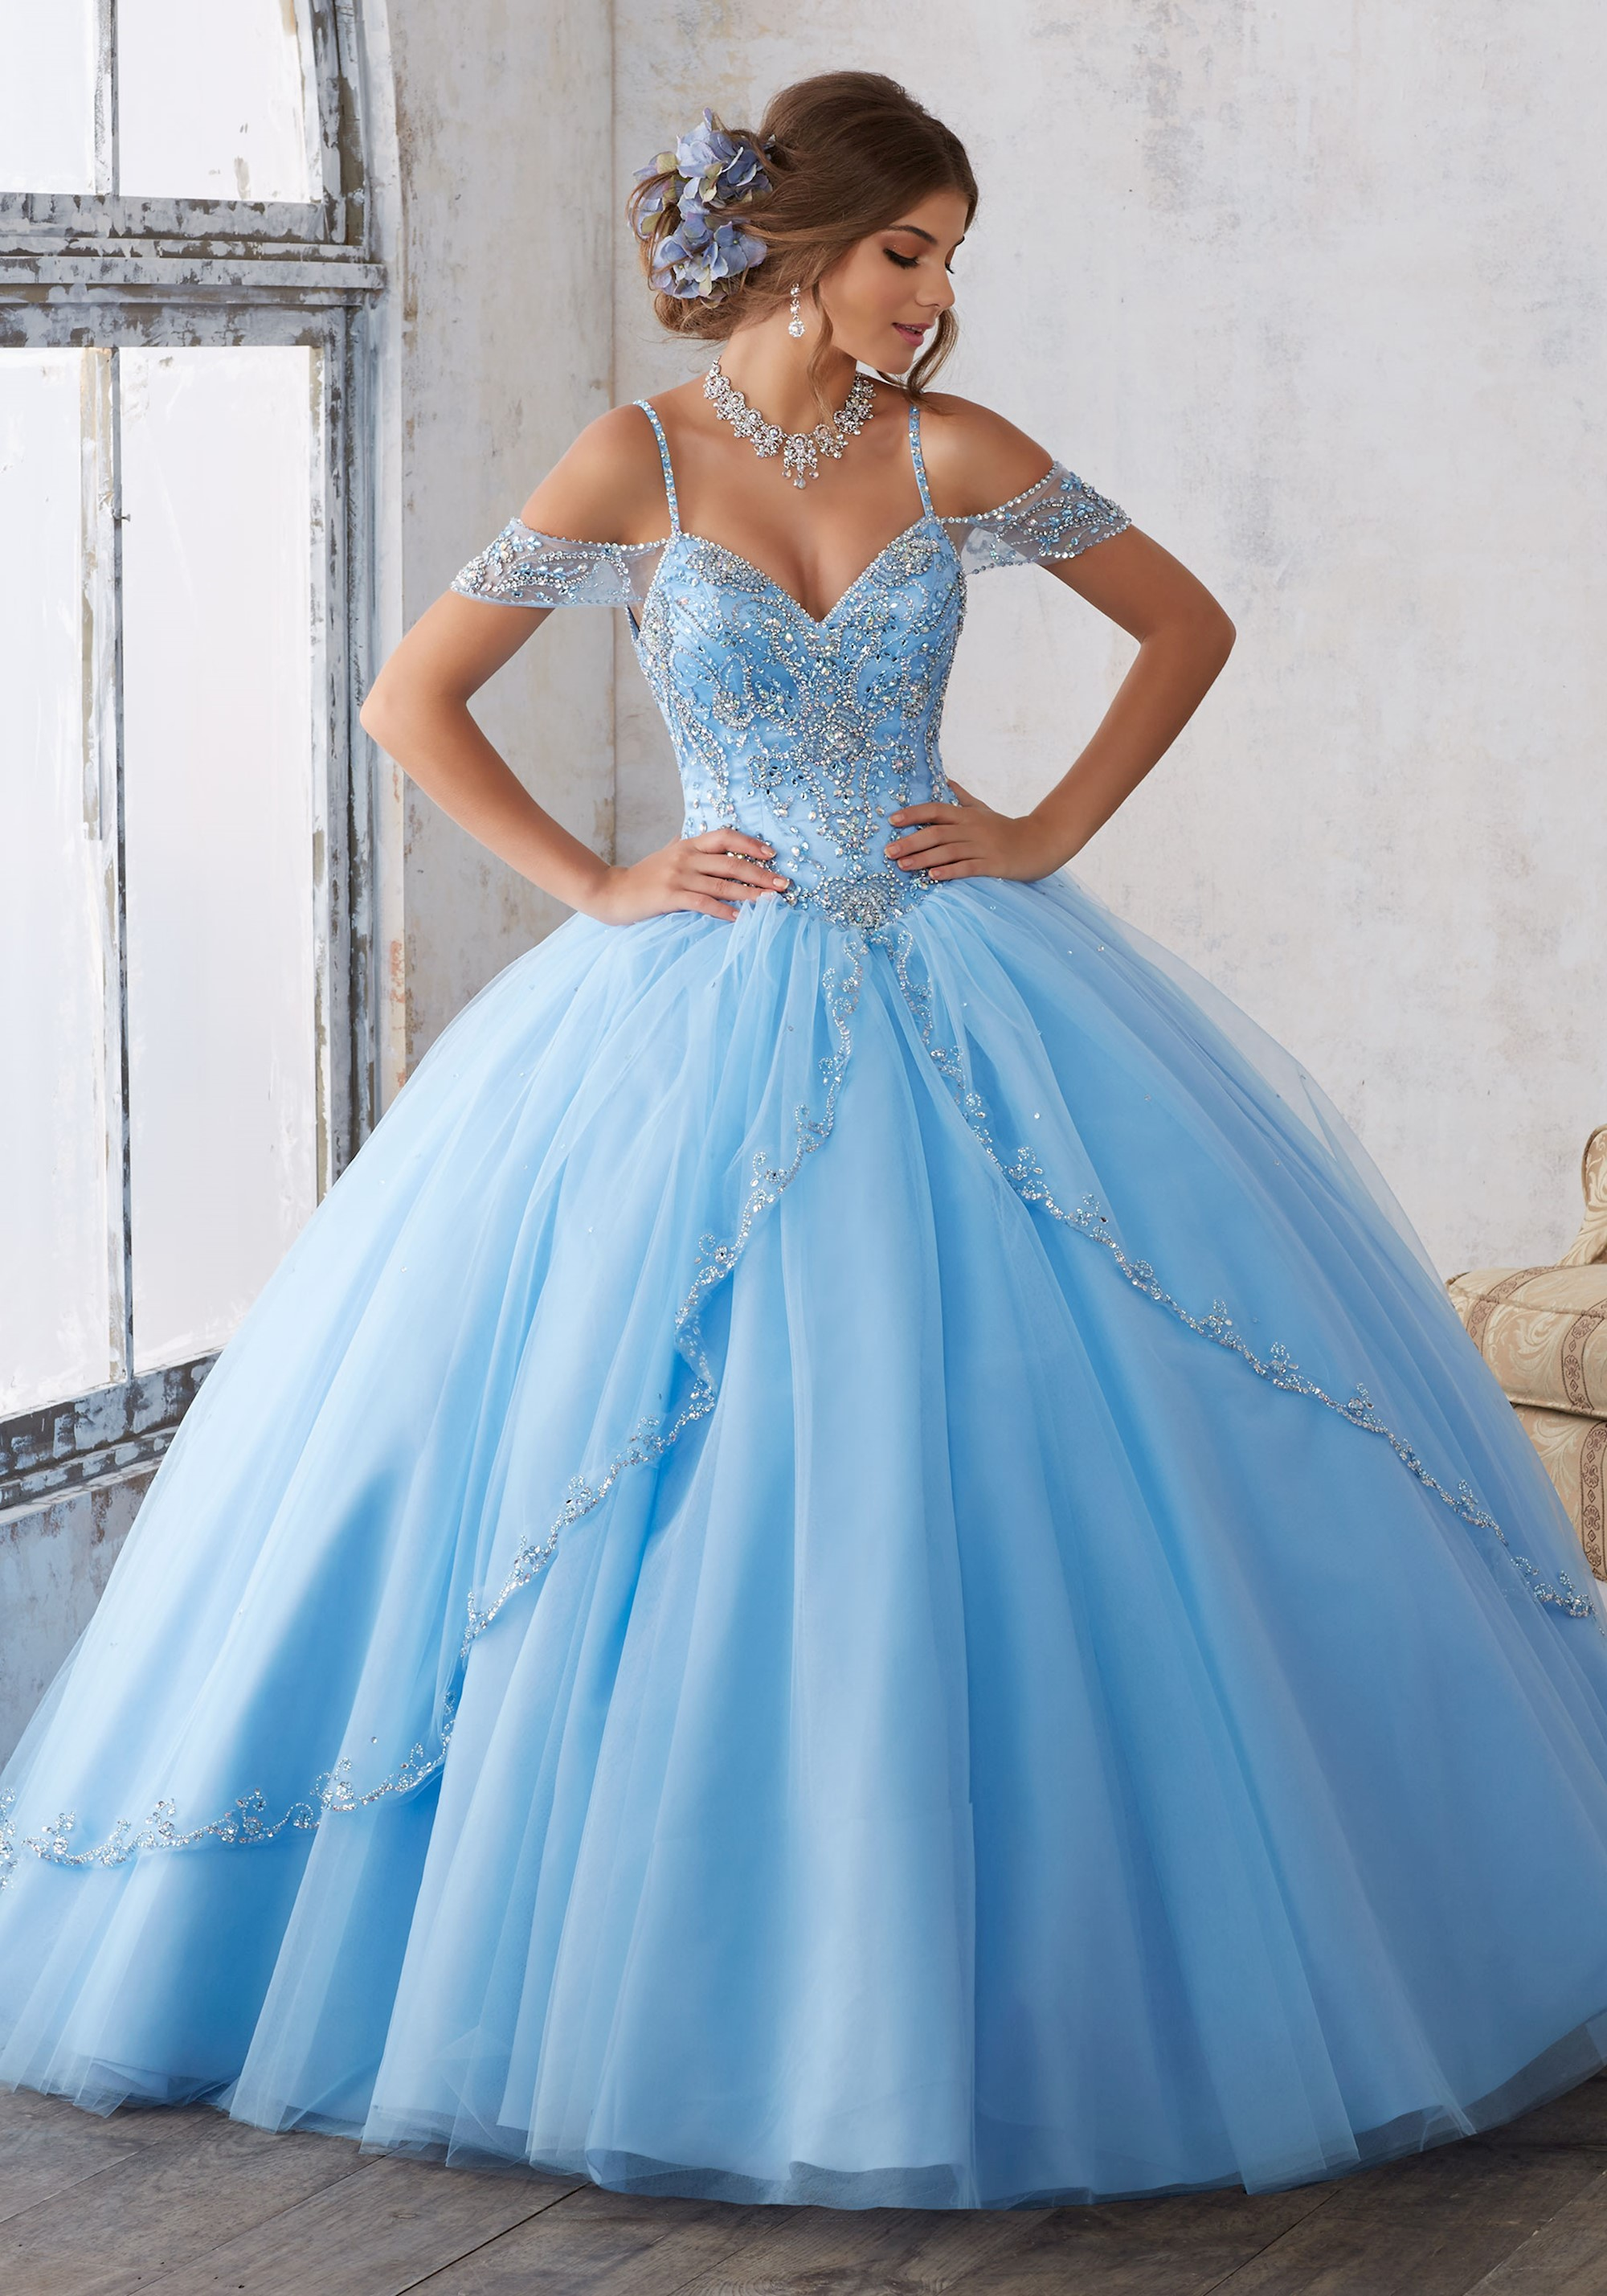 Plus Dresses size prom, Stylish best teacher bag